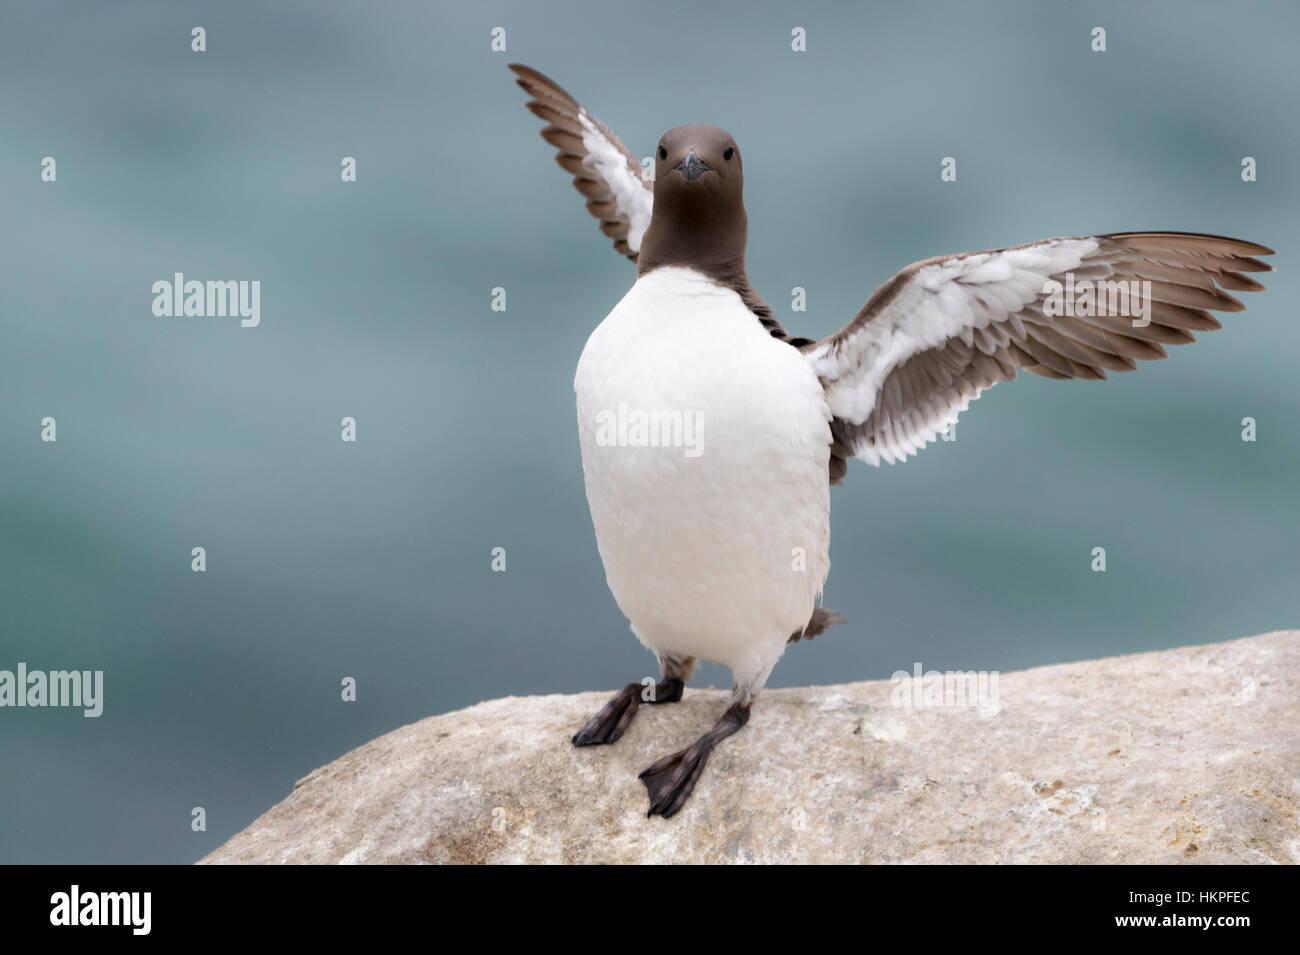 Common Guillemot (Uria aalge) adult, standing on coastal cliff, flapping wings, Great Saltee, Saltee Islands, Ireland - Stock Image